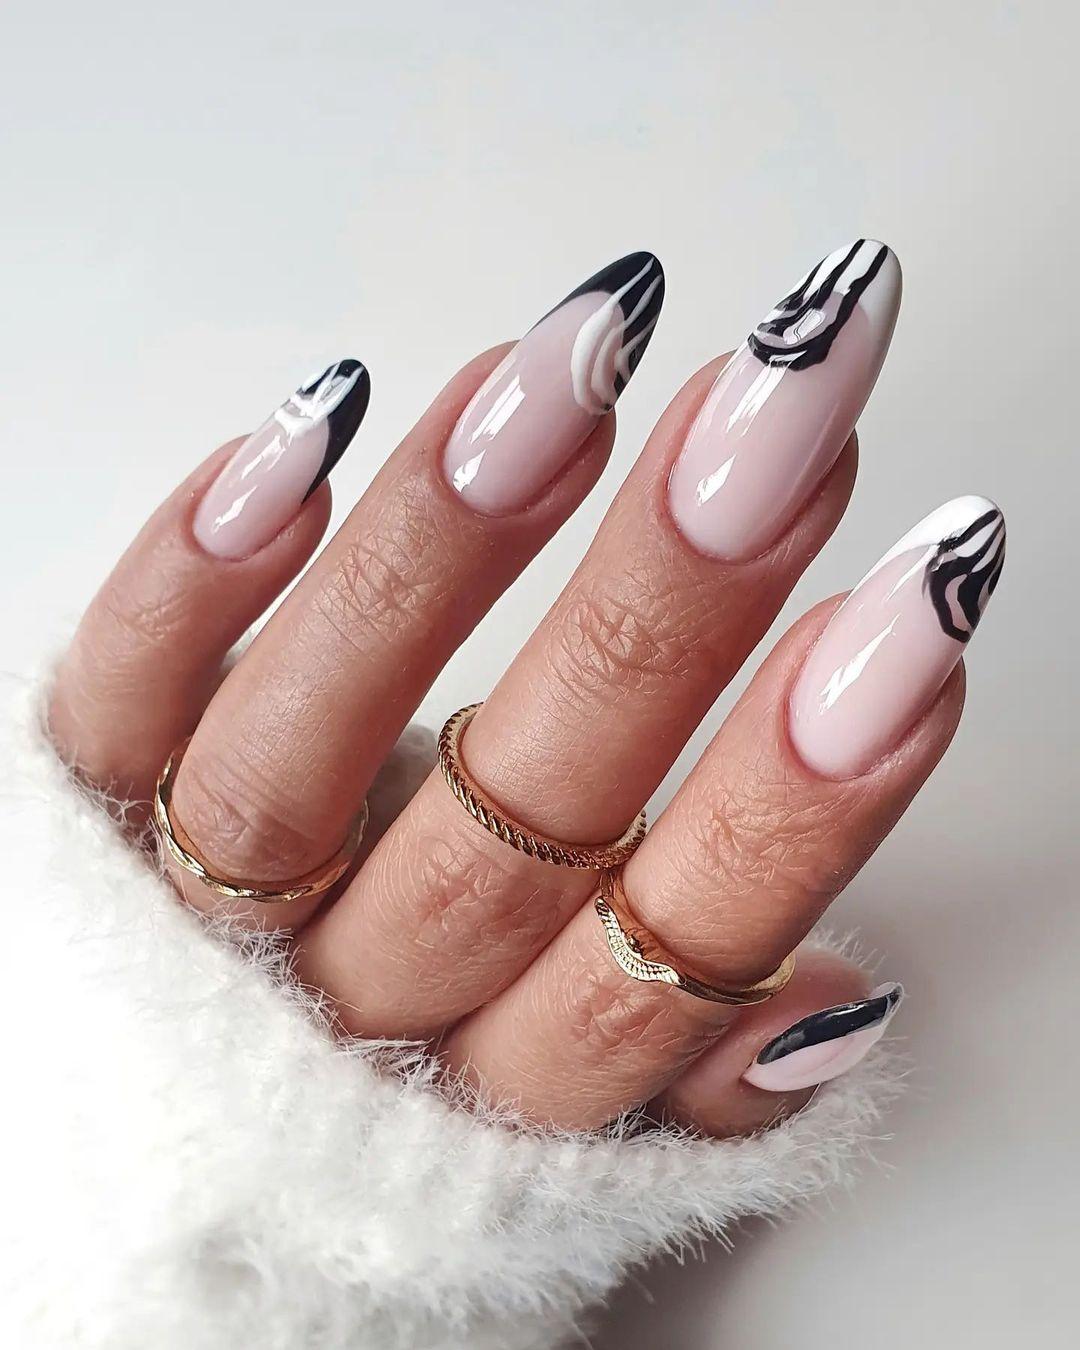 clear nails with francesinha 9